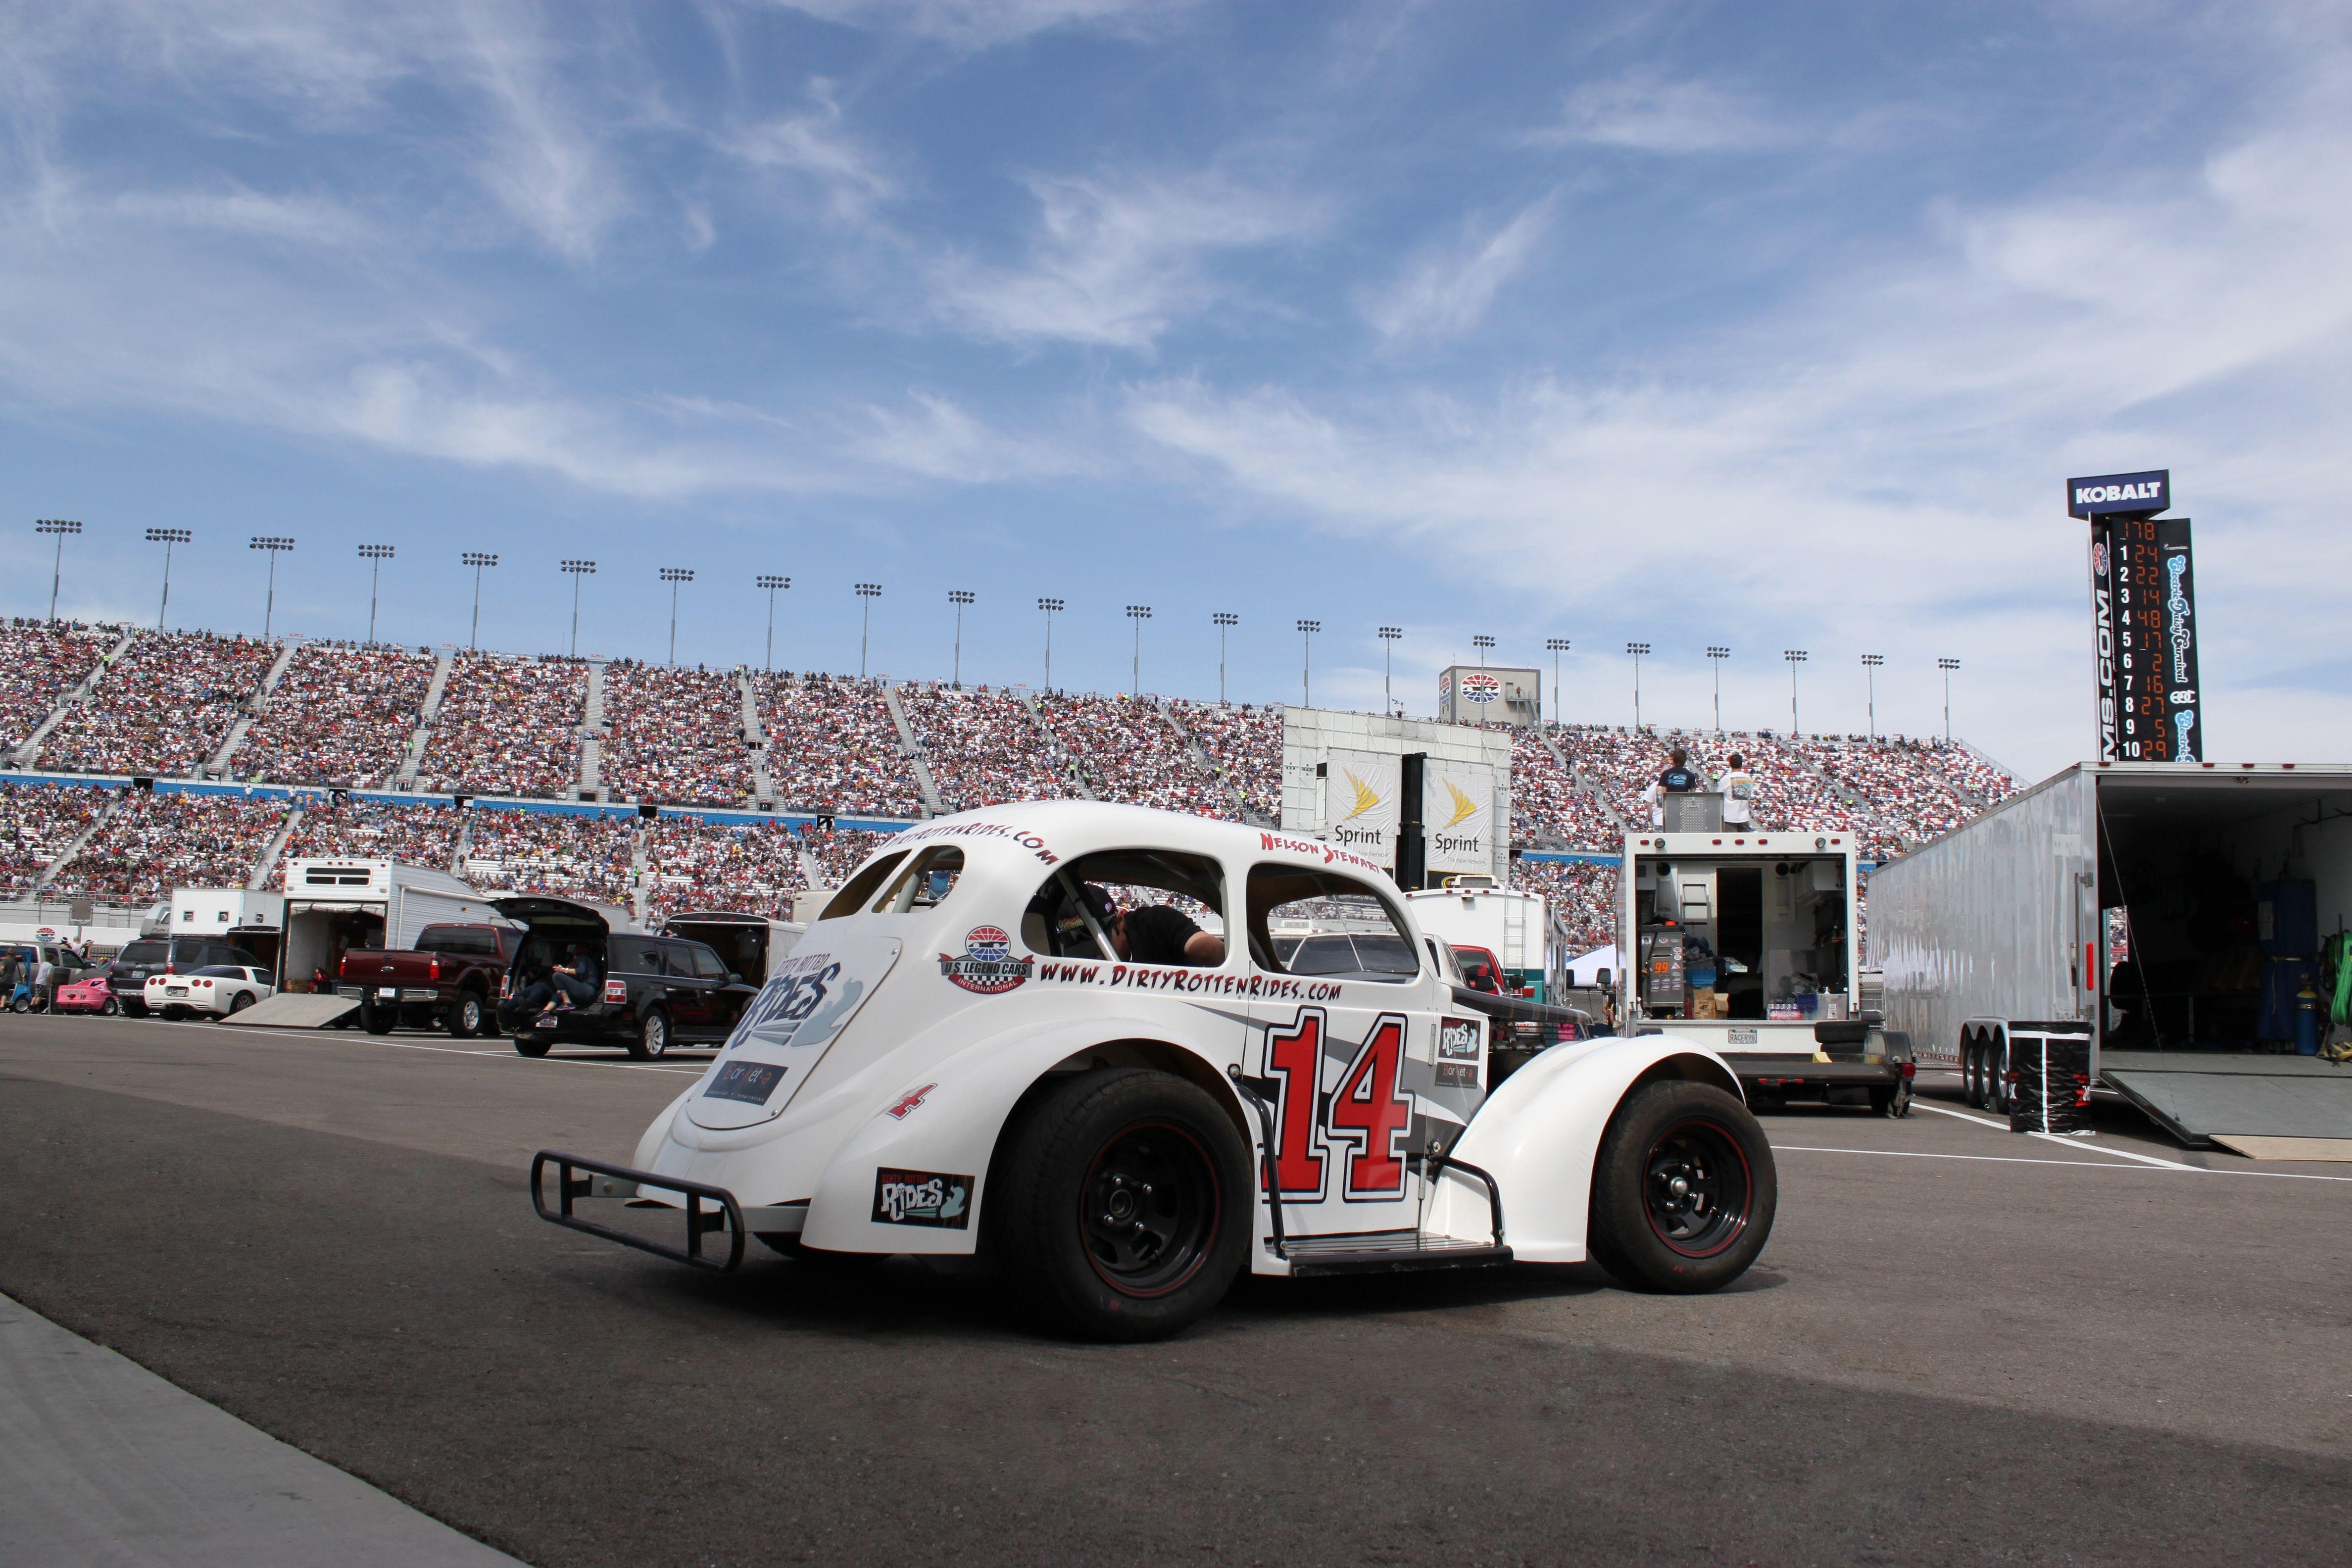 Legends Car Cars Series Racing Race Cars